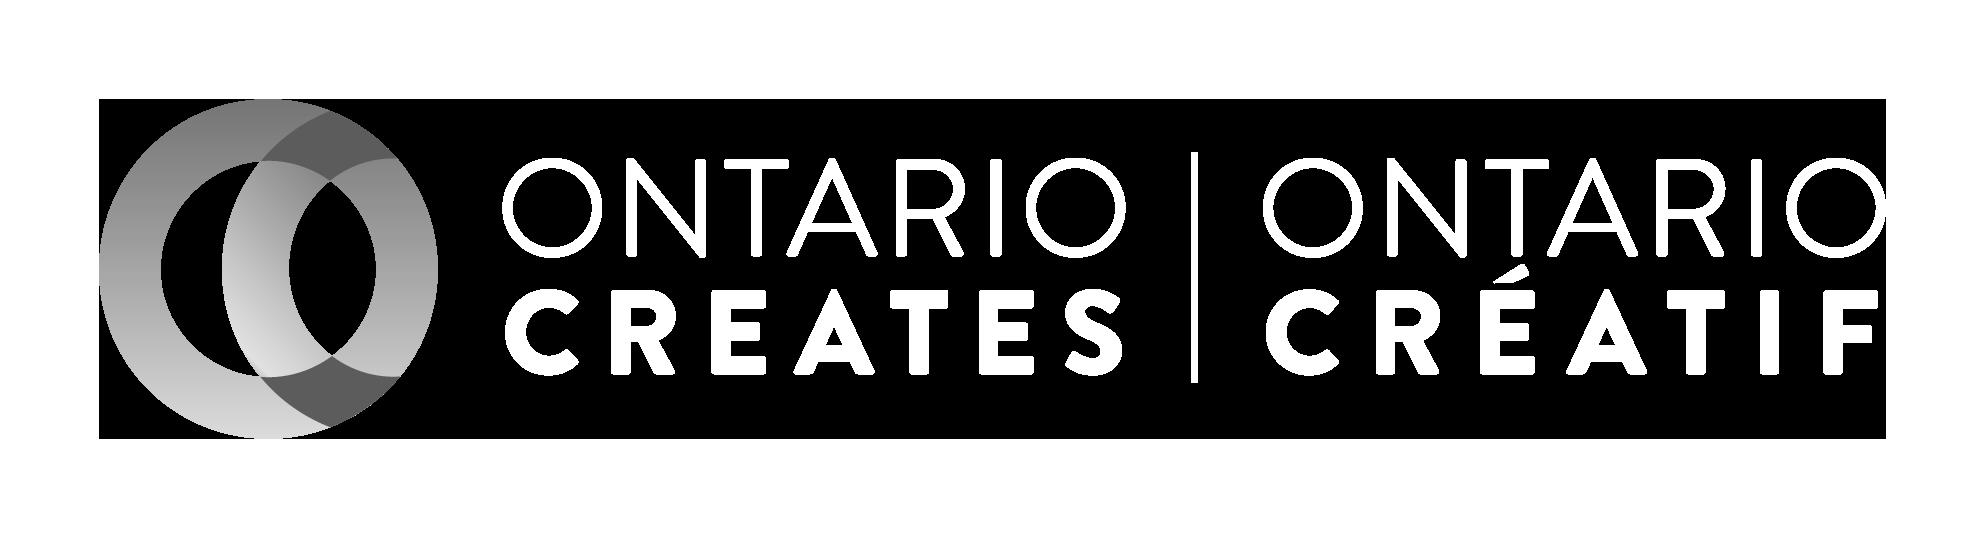 Ontario Creates Logo.